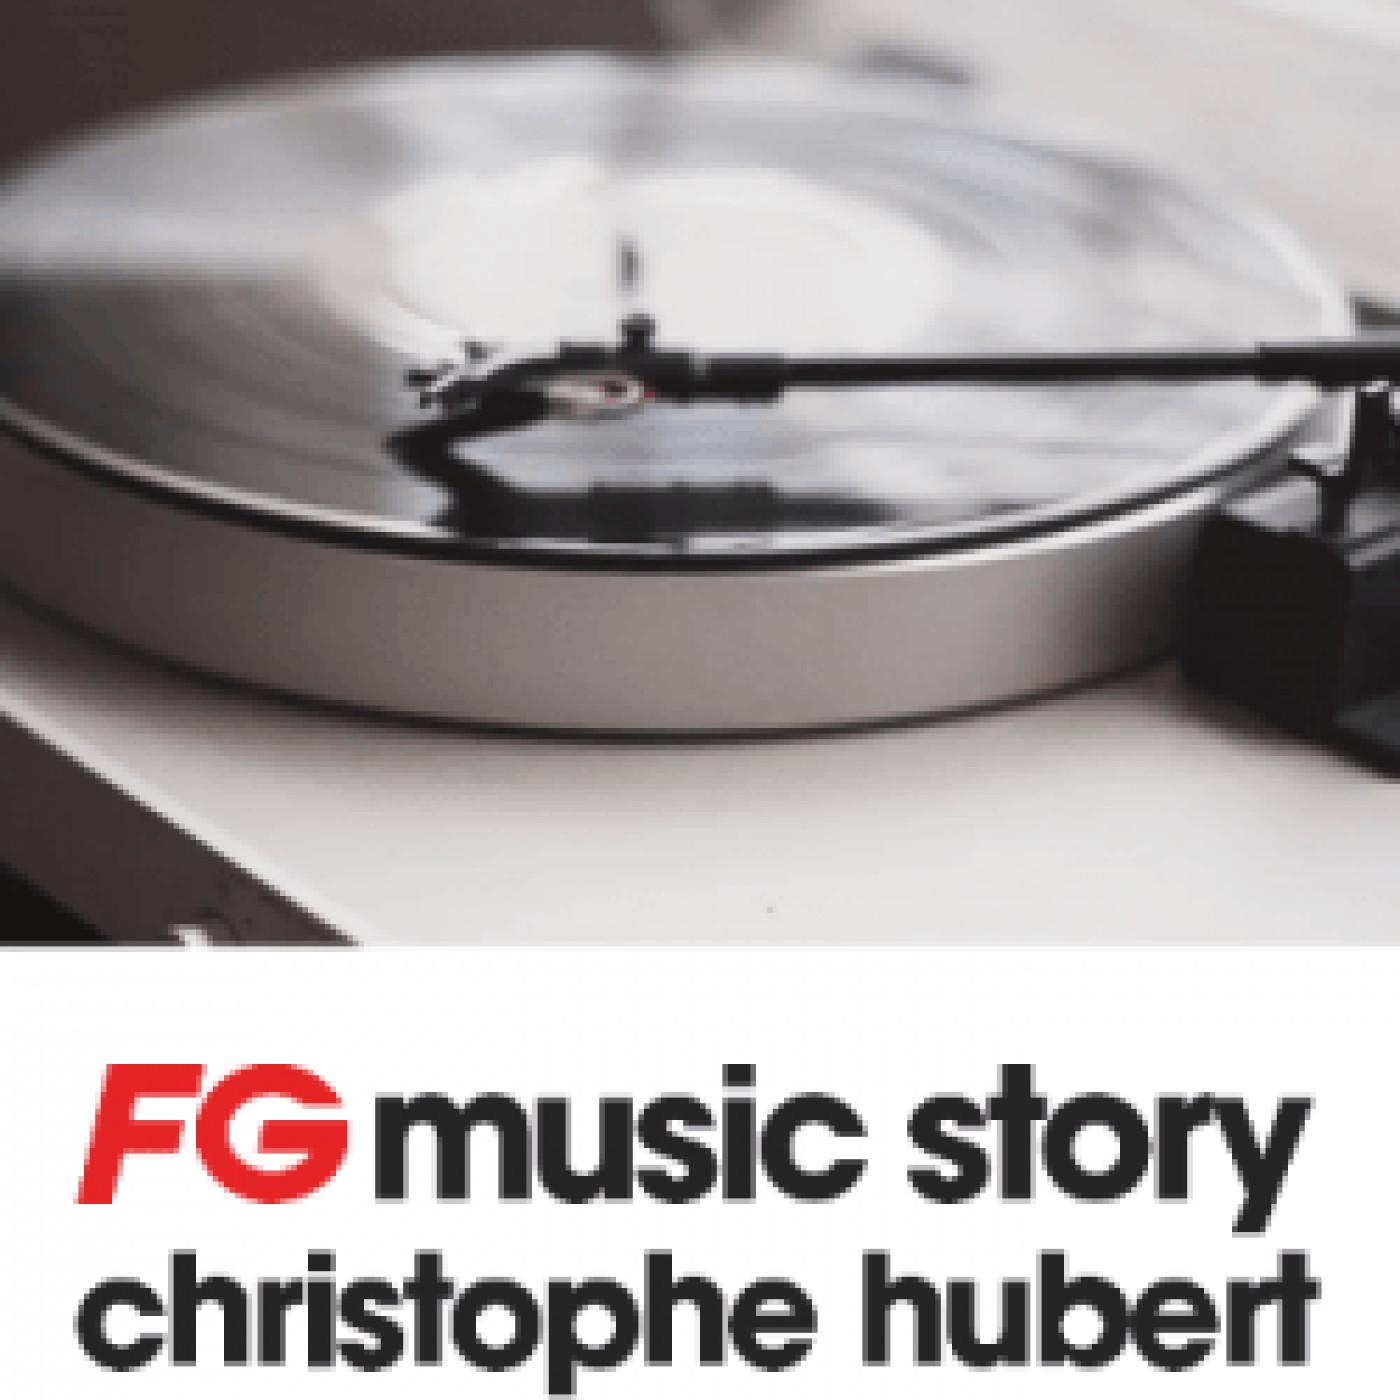 FG MUSIC STORY : SOPHIE ELIS BEXTOR